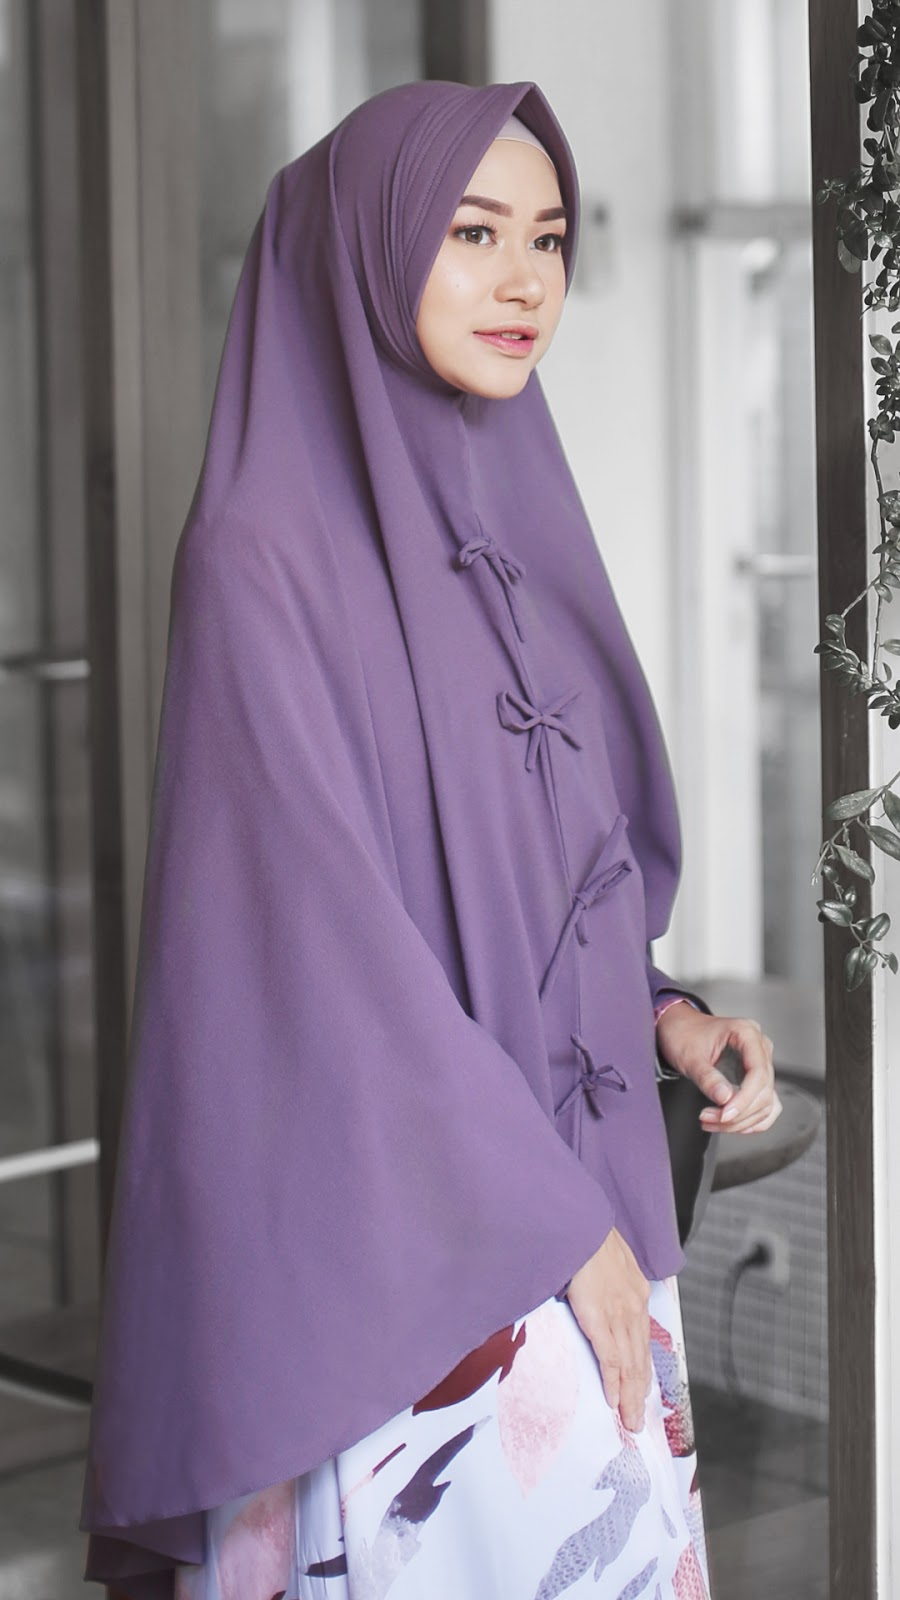 wallpaper HD muslimah cantik hijab bibri indah dan tipis manis